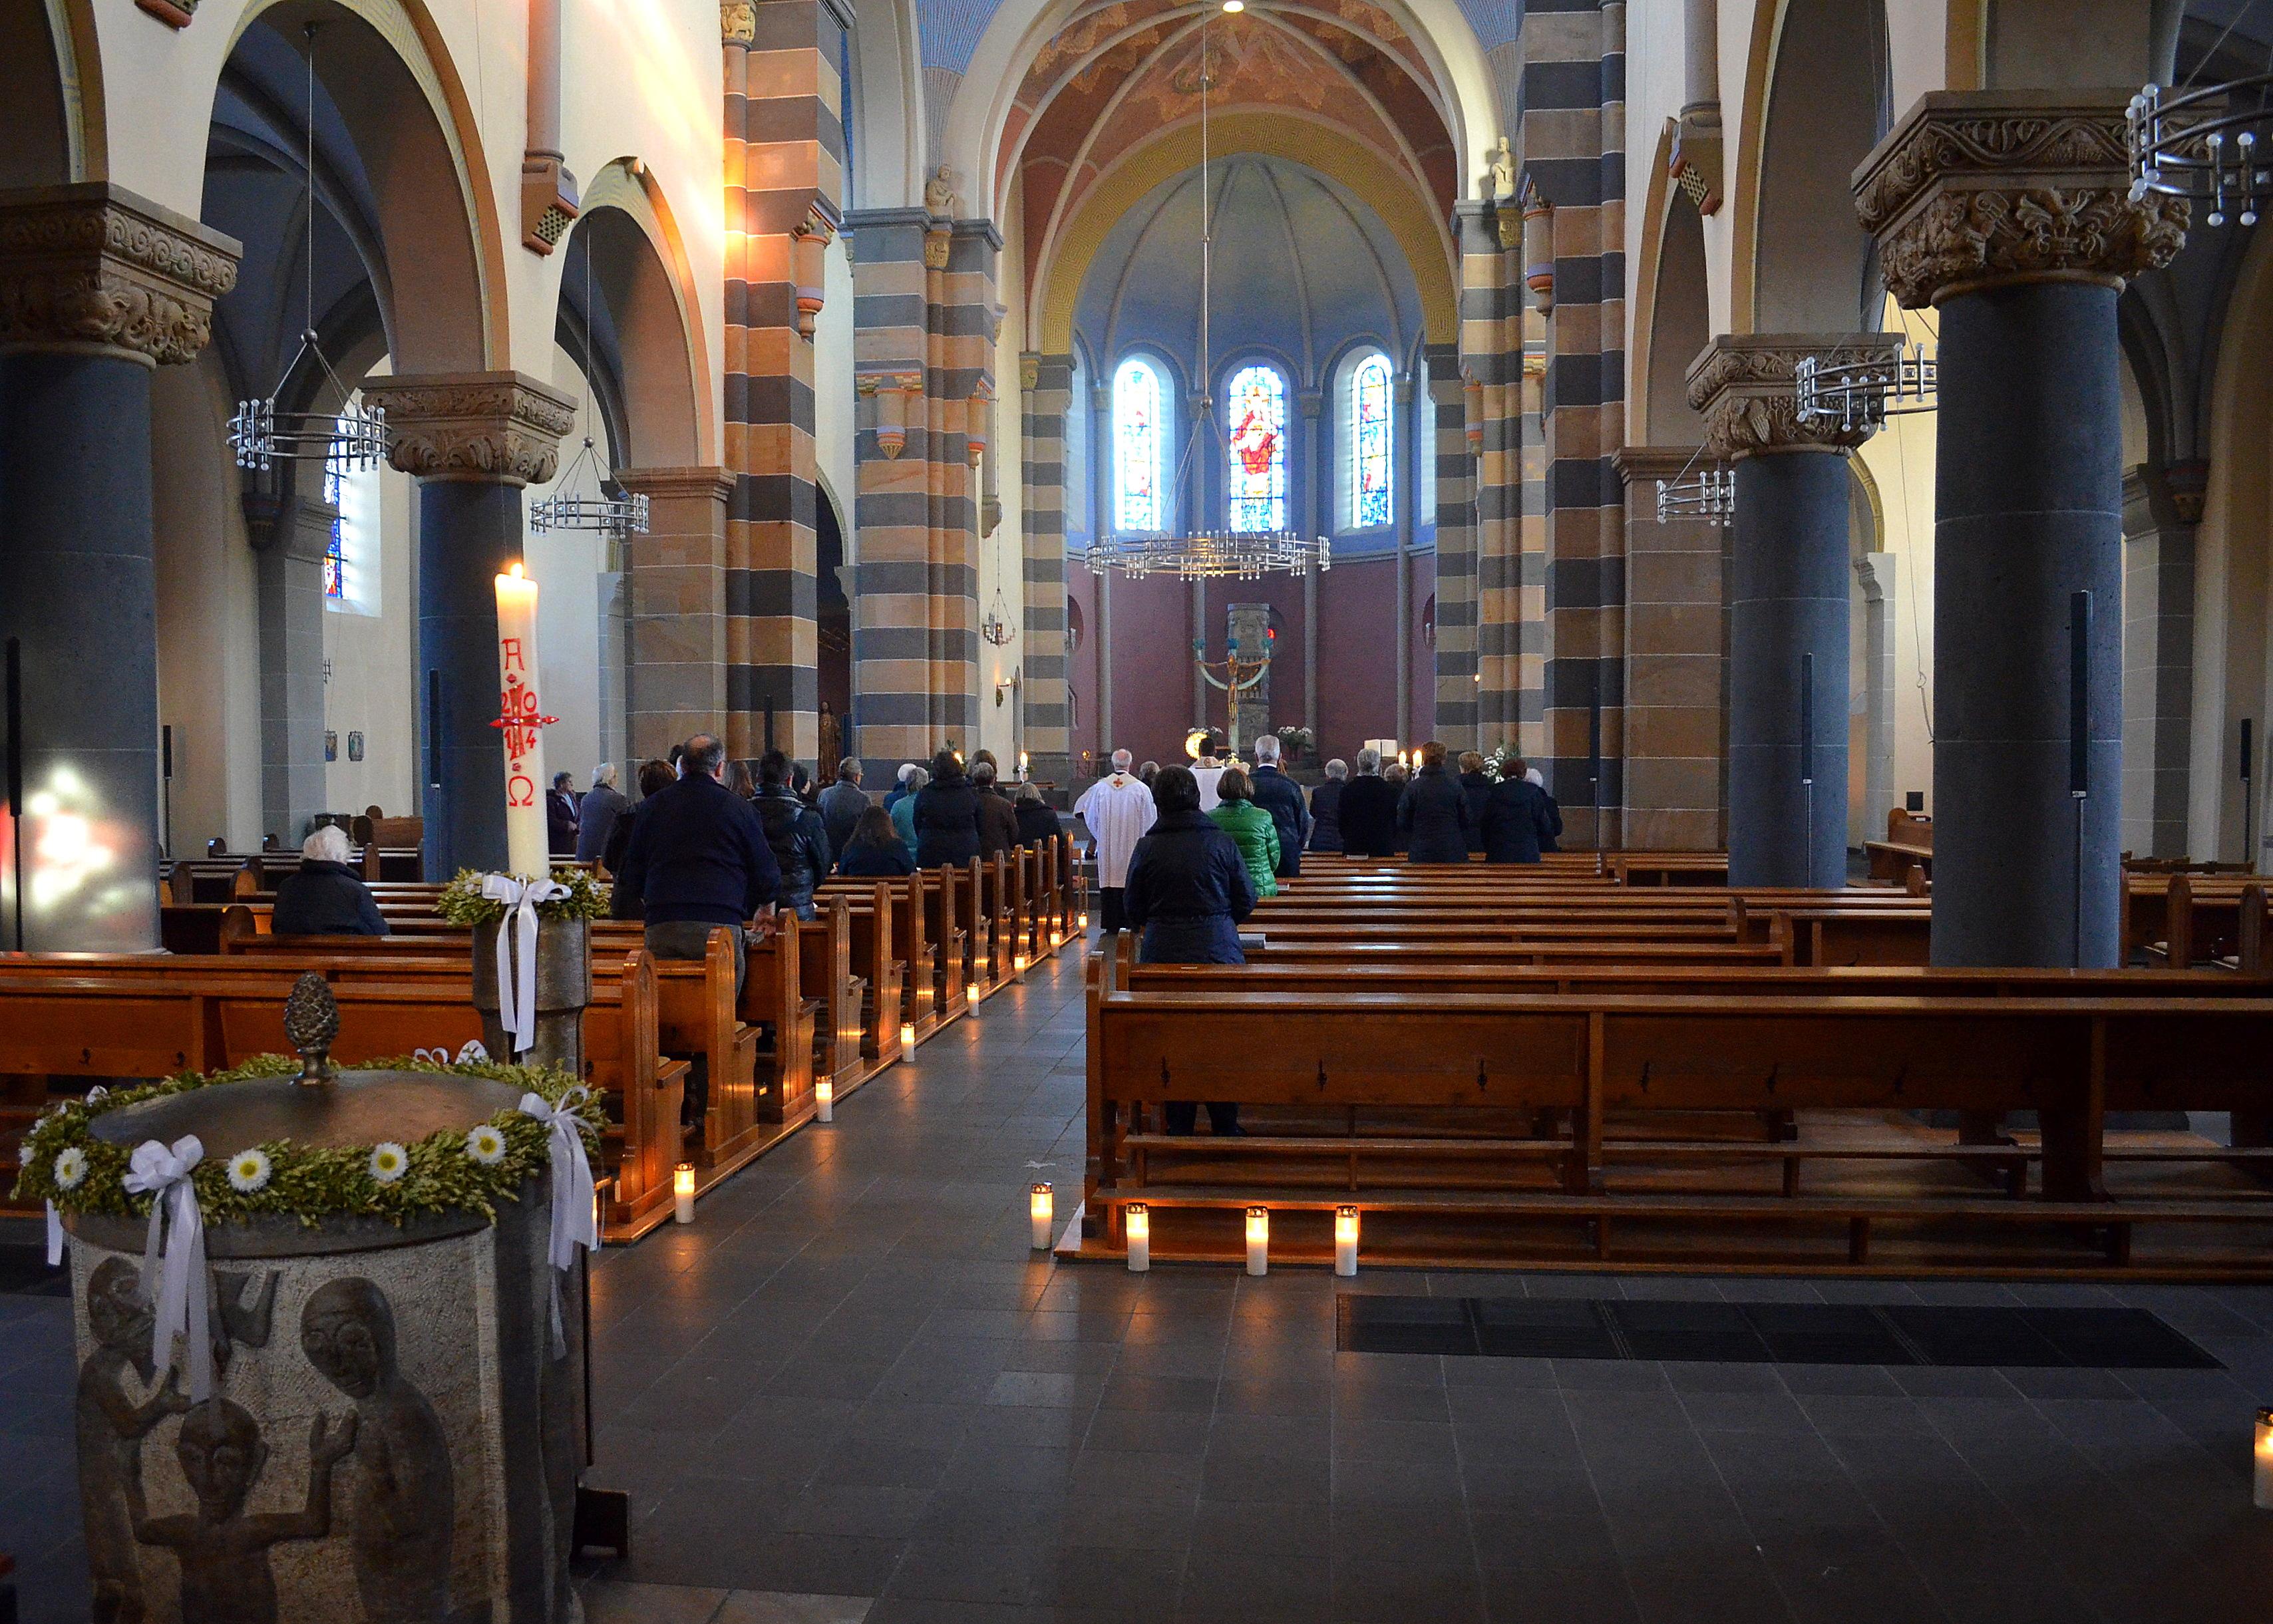 Bestand mayen heilig hartkerk wikipedia for Interieur wikipedia